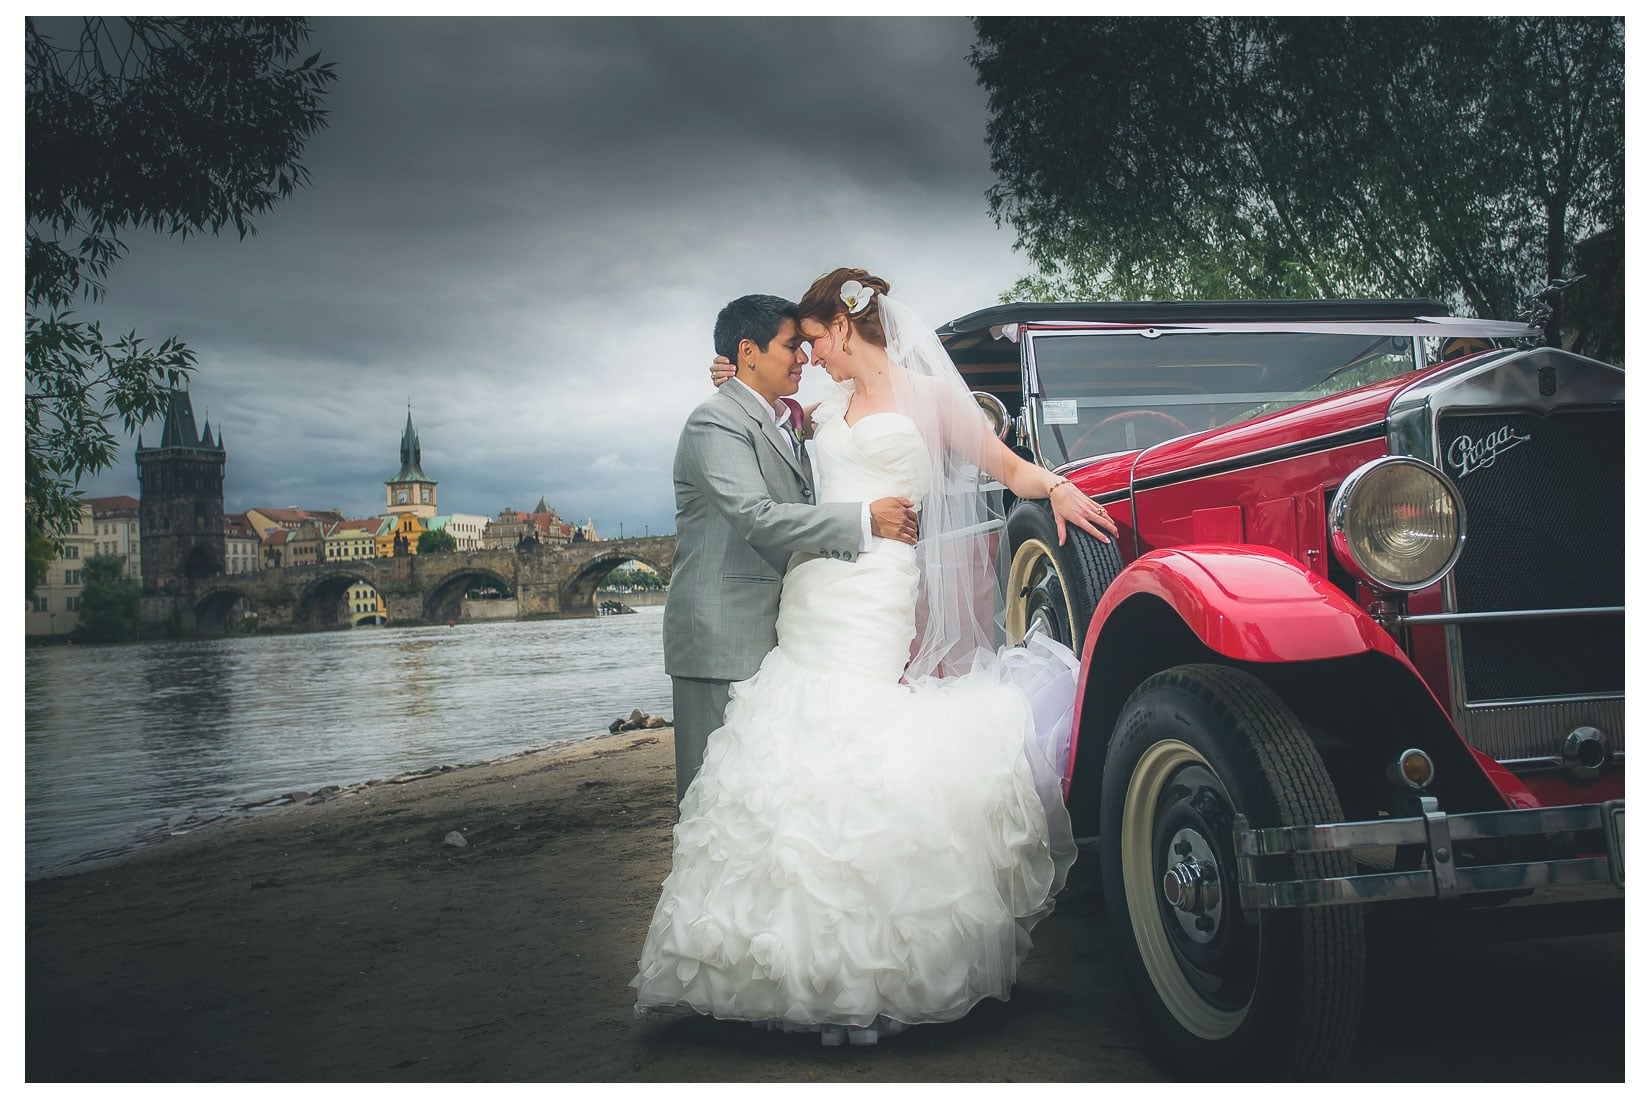 Charles Bridge Wedding / Kimberly & Jules / Na Plavka wedding portraits